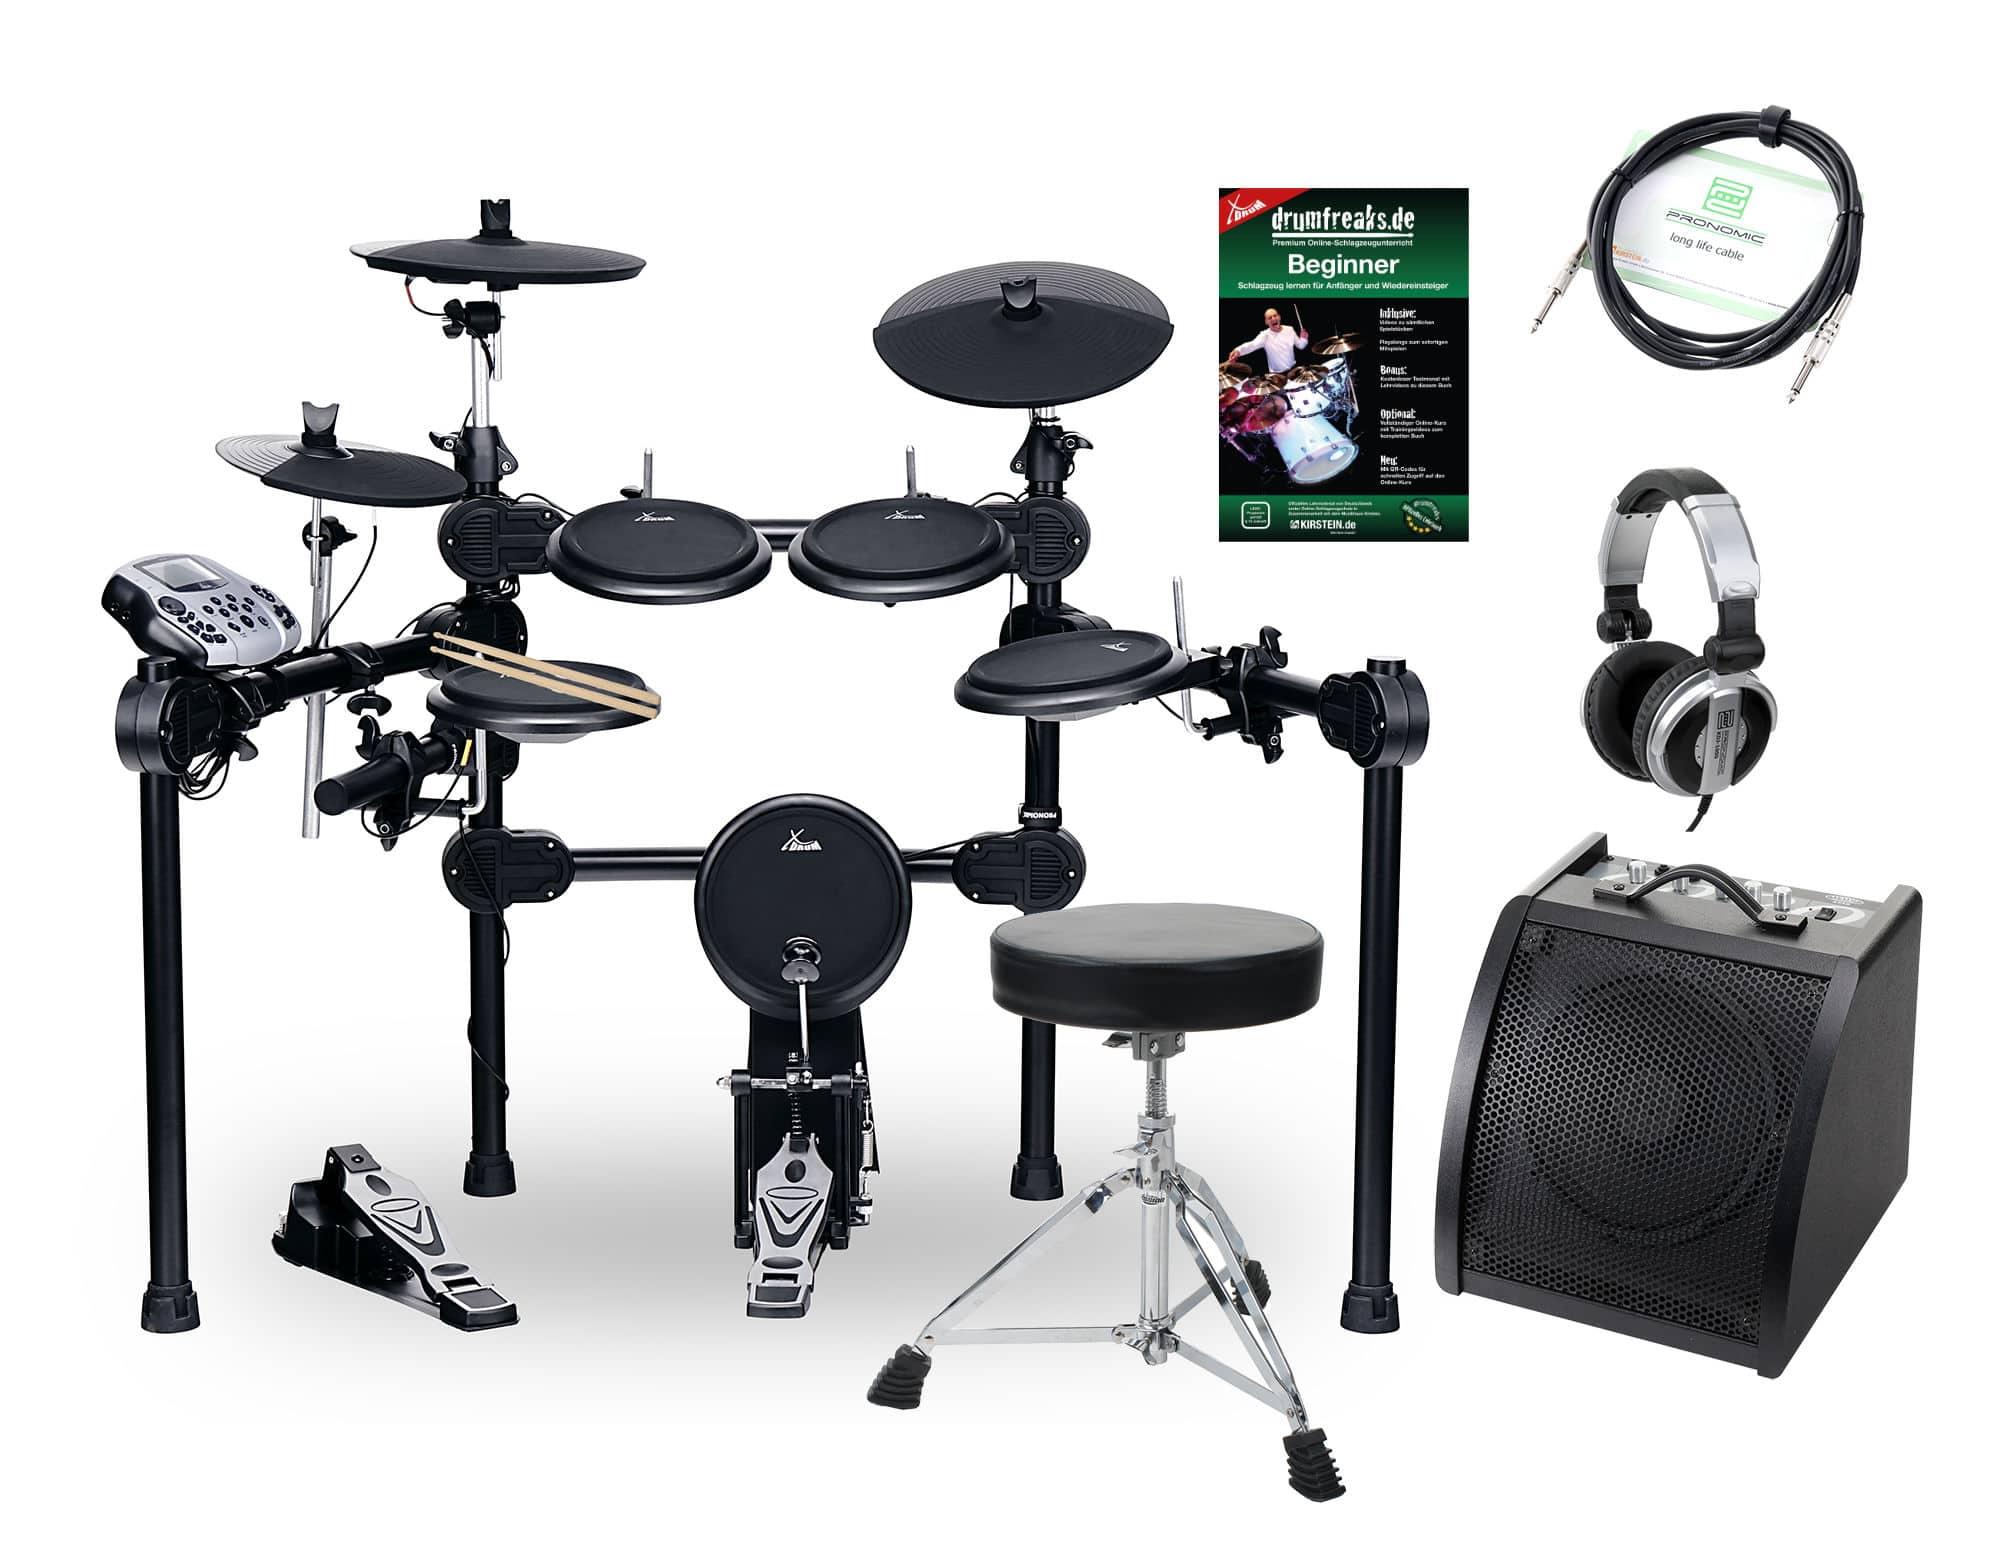 XDrum DD 520 E Drum Kit SET 2